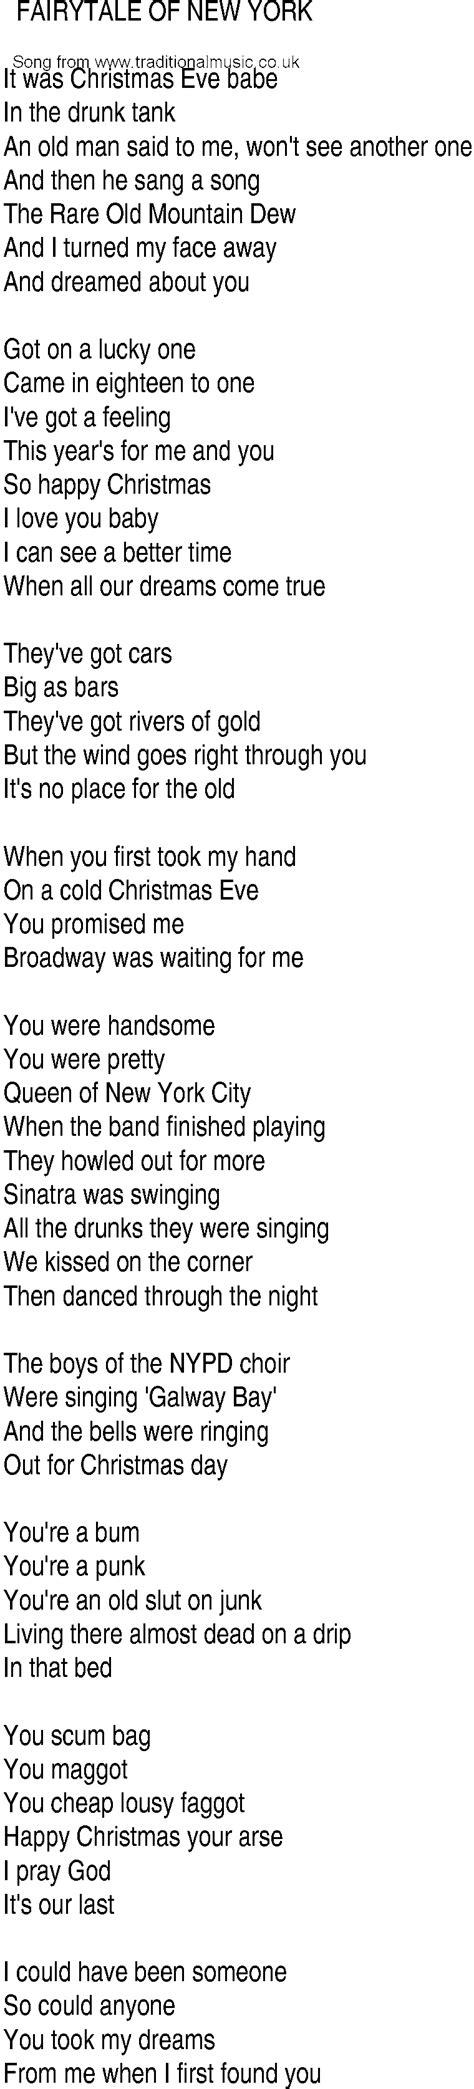 song nyc irish music song and ballad lyrics for fairytale of new york